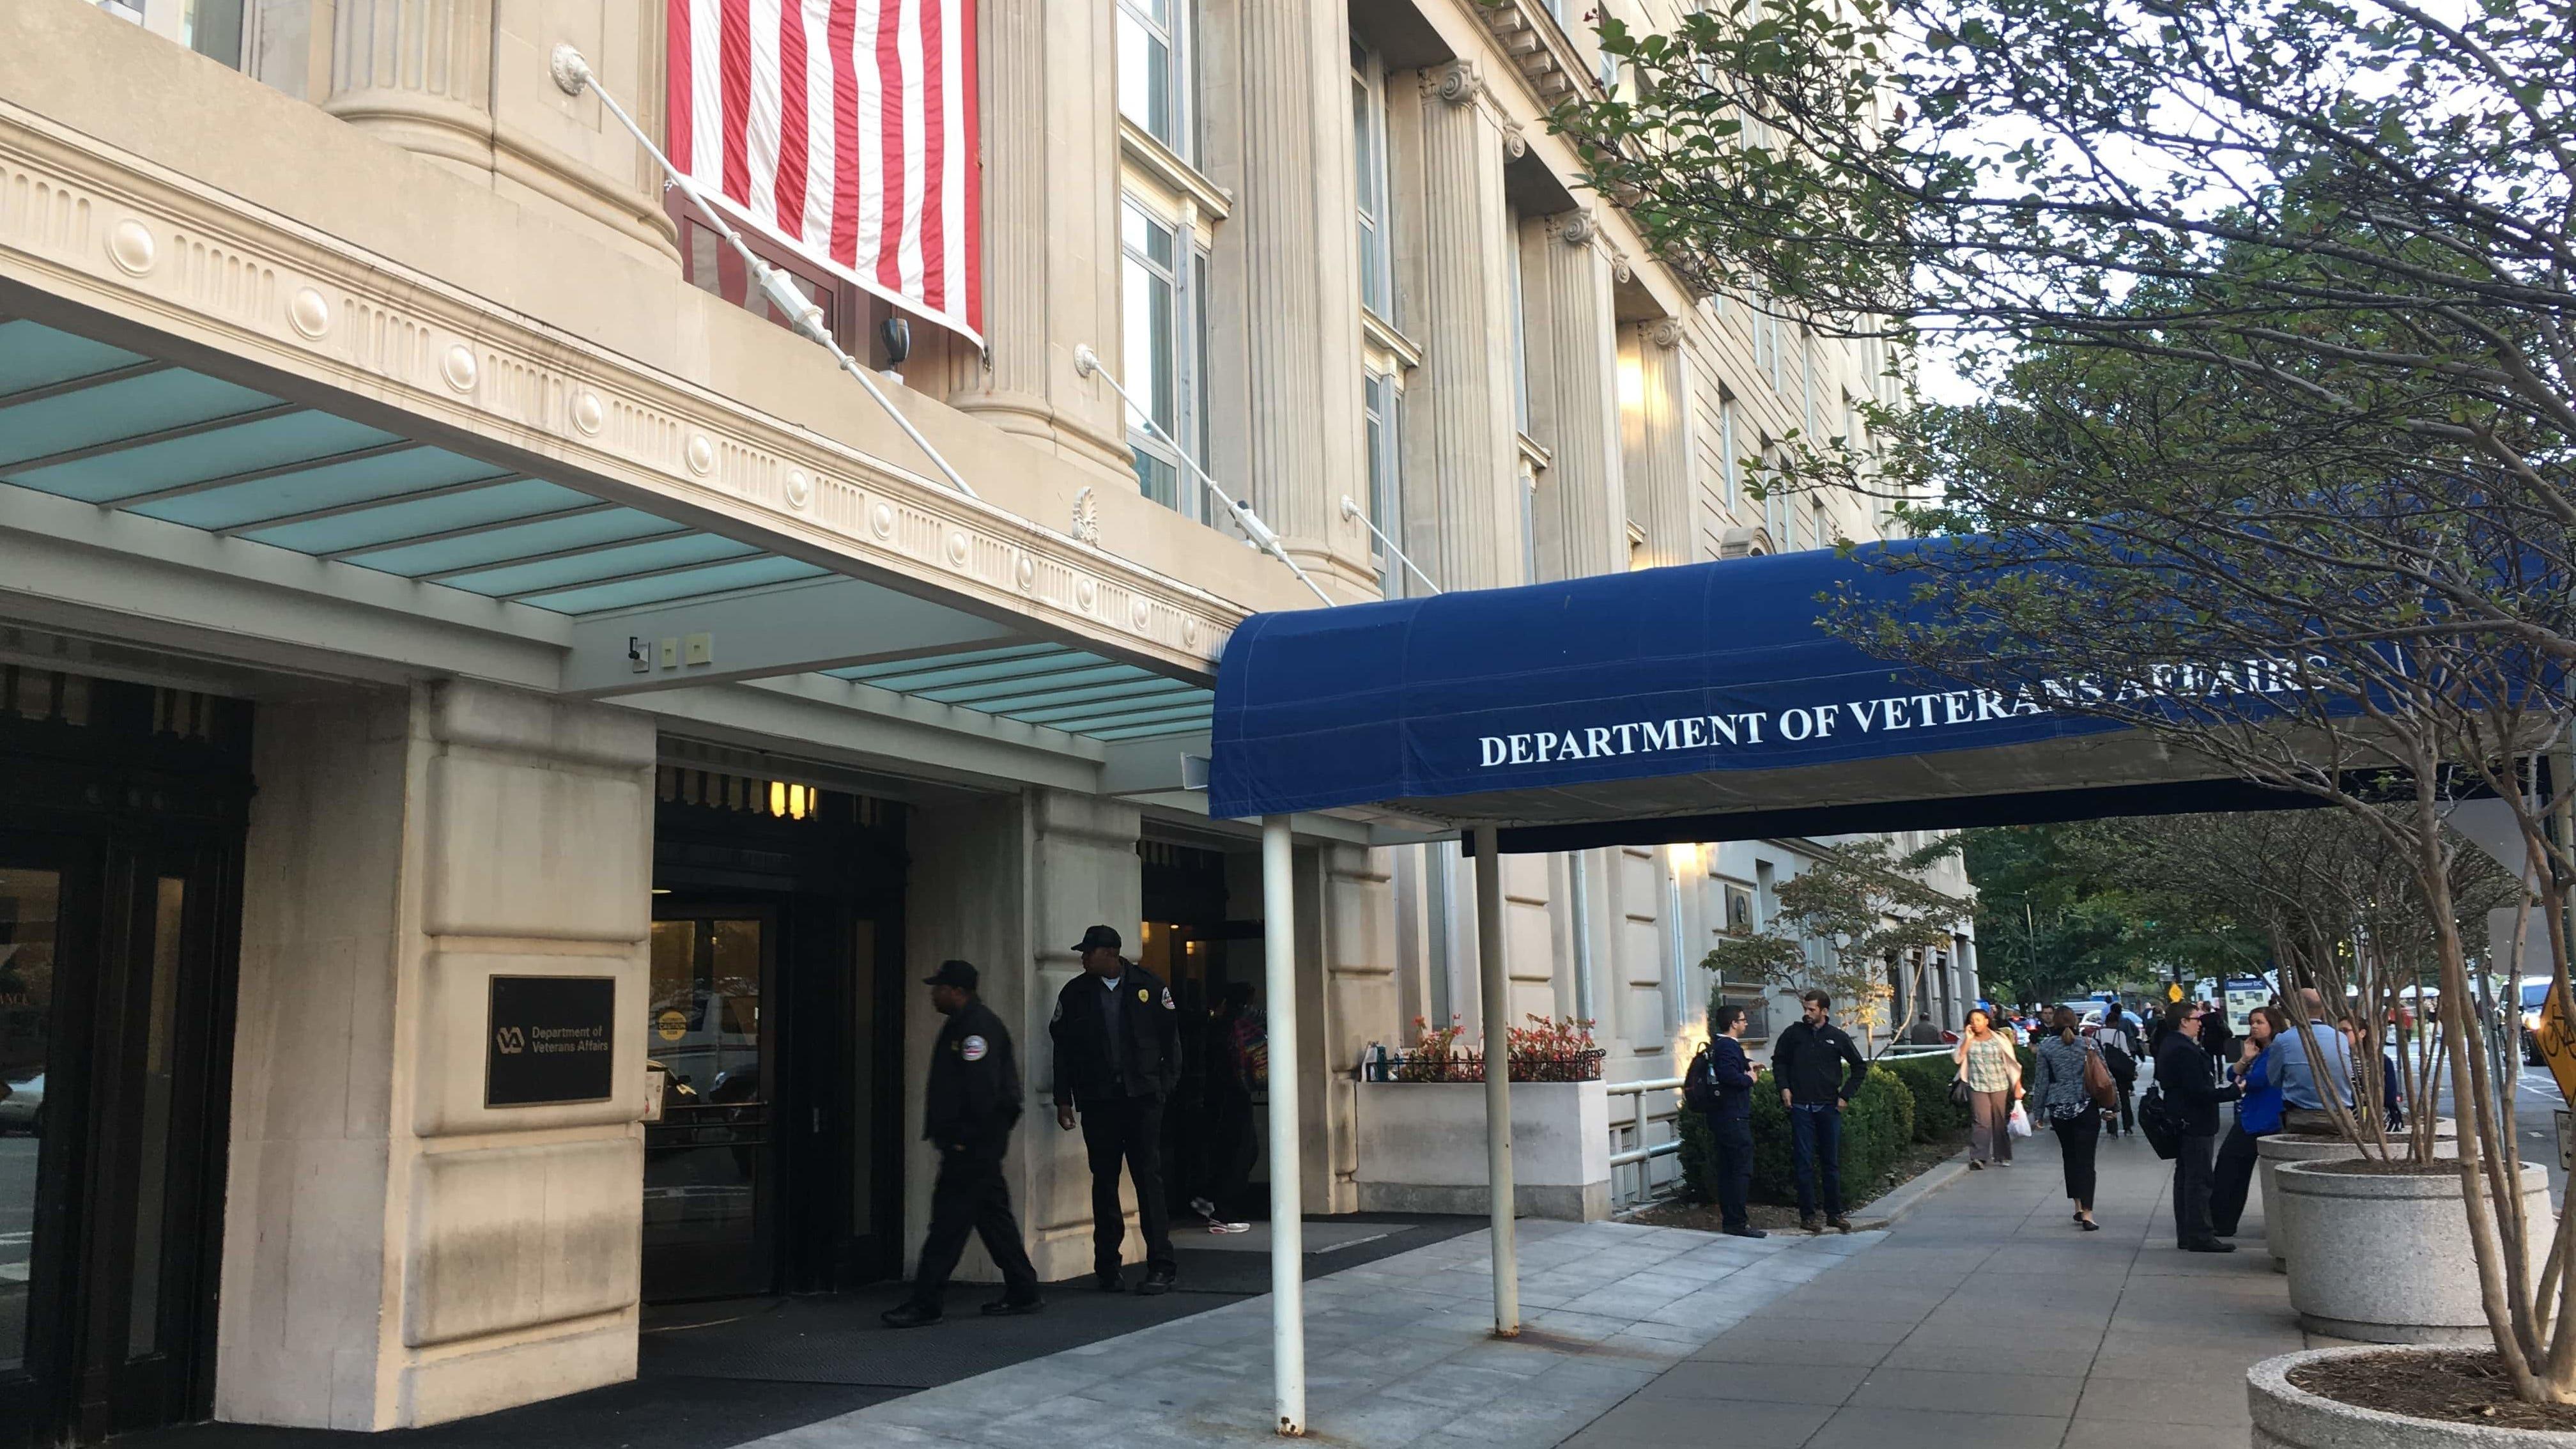 The Washington, D.C., headquarters of the Department of Veterans Affairs.